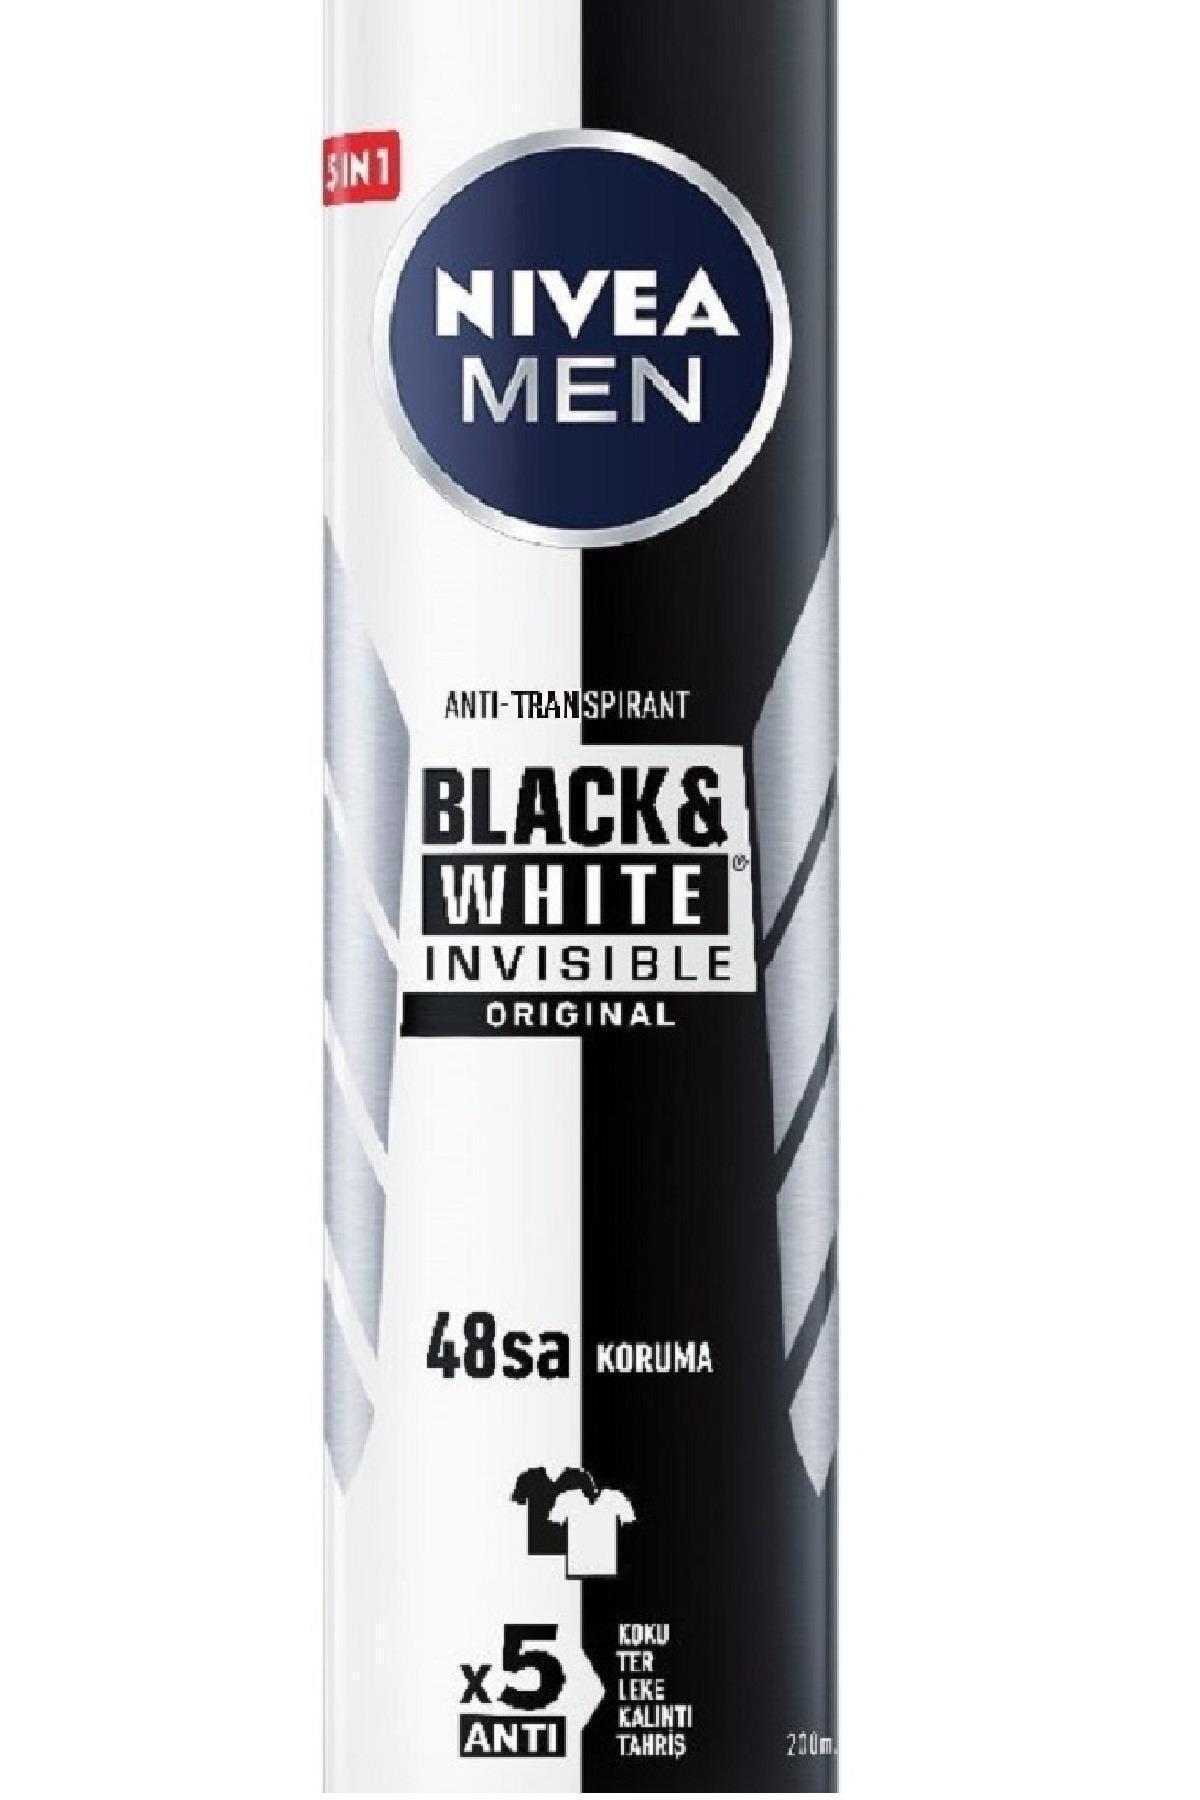 Nivea Men Invisible Black & White Original Erkek Deodorant 200ml 2